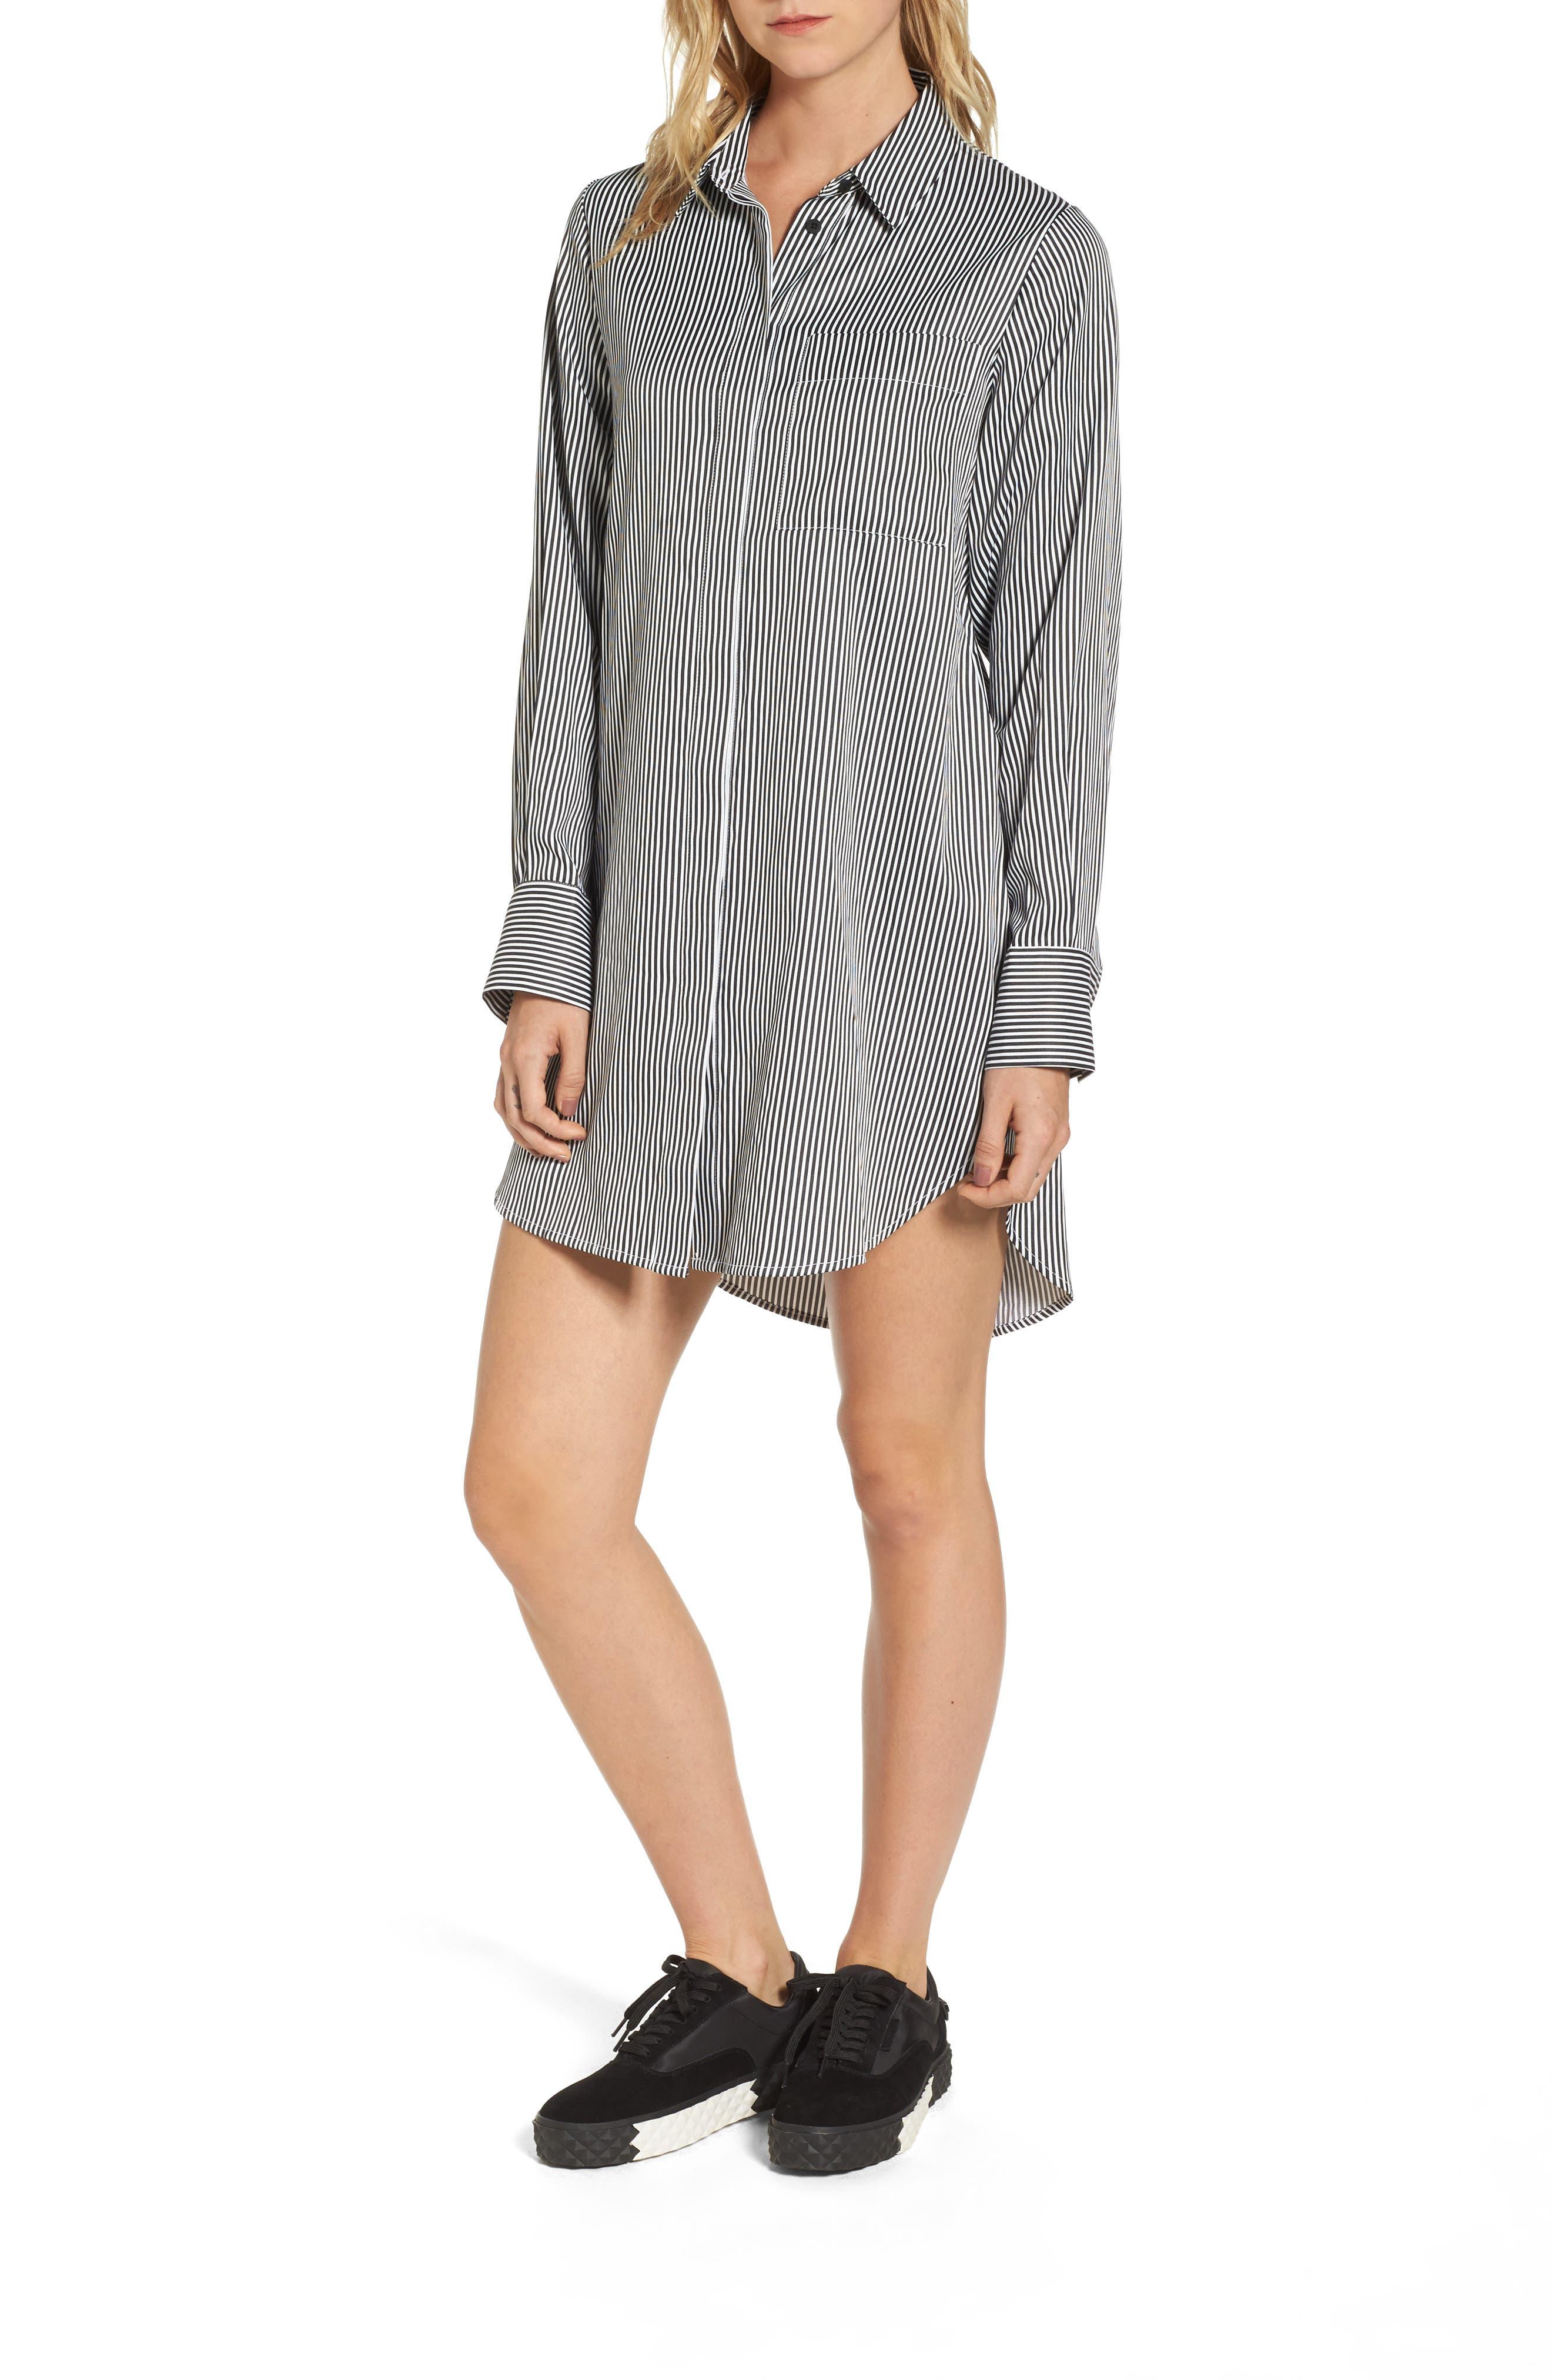 KENDALL + KYLIE Lace-Up Back Shirtdress